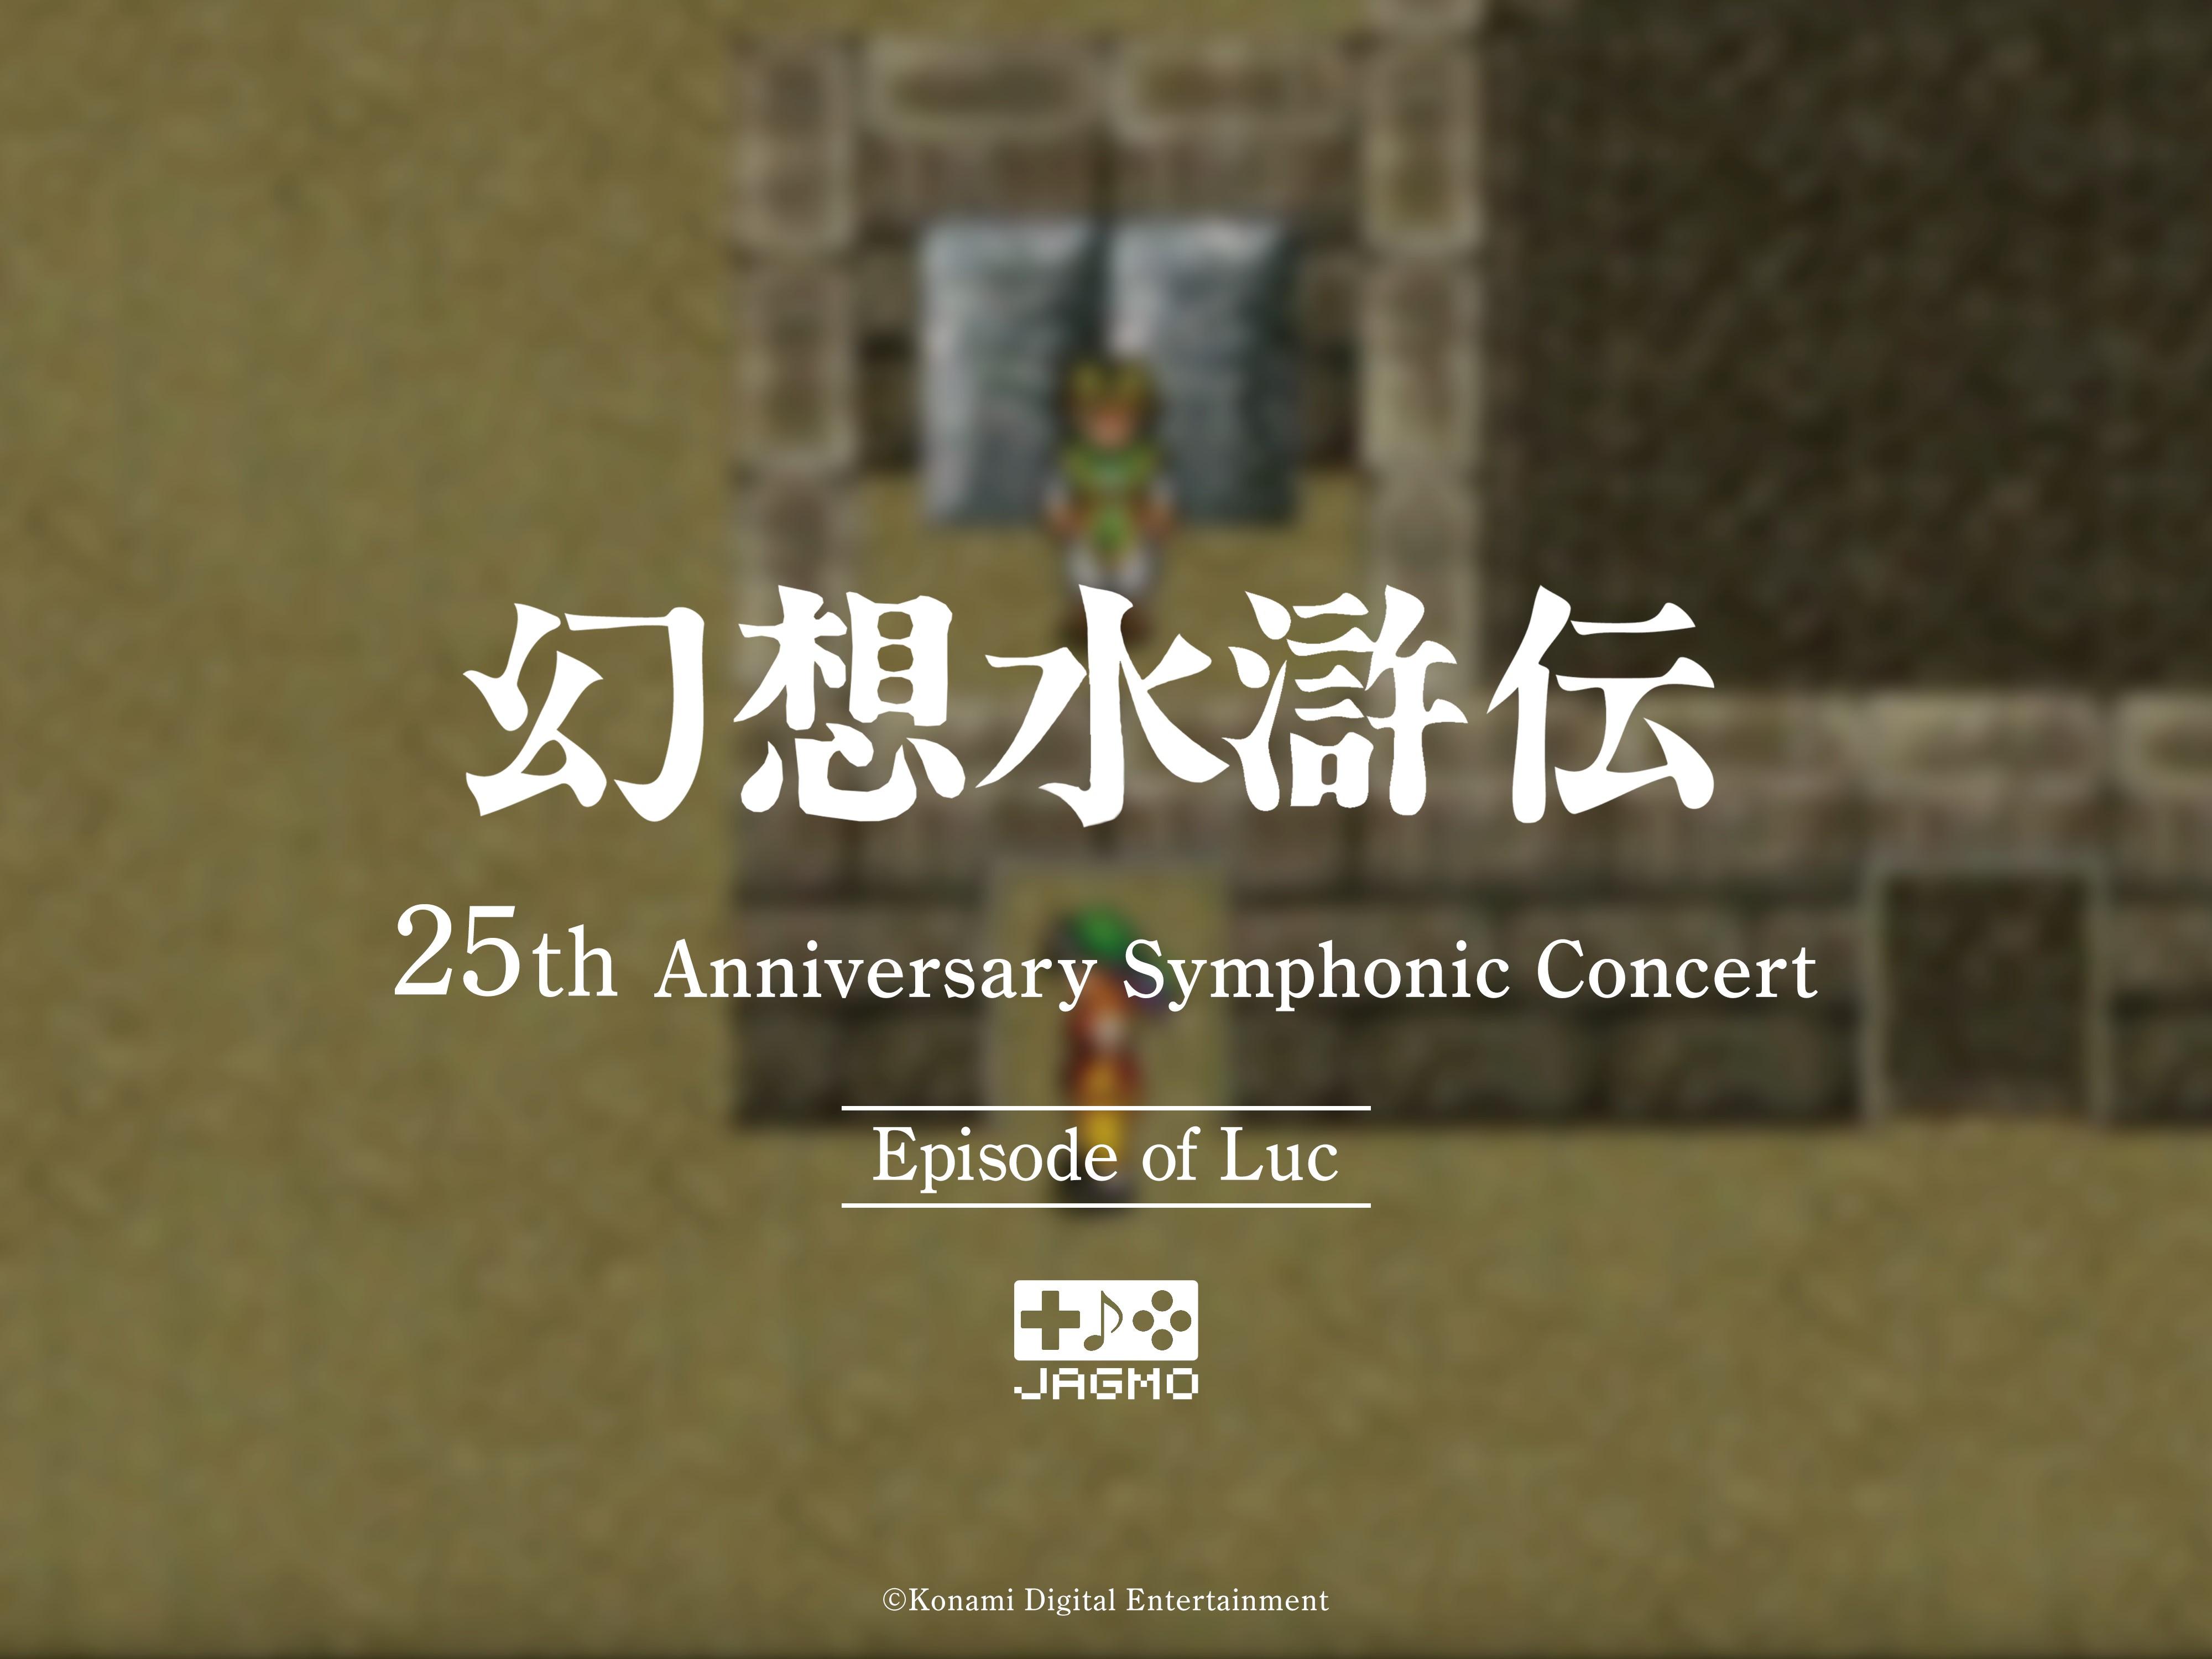 幻想水滸伝 25th Anniversary Symphonic Concert Online -Episode of Luc- | 演奏:JAGMO 指揮:松元宏康